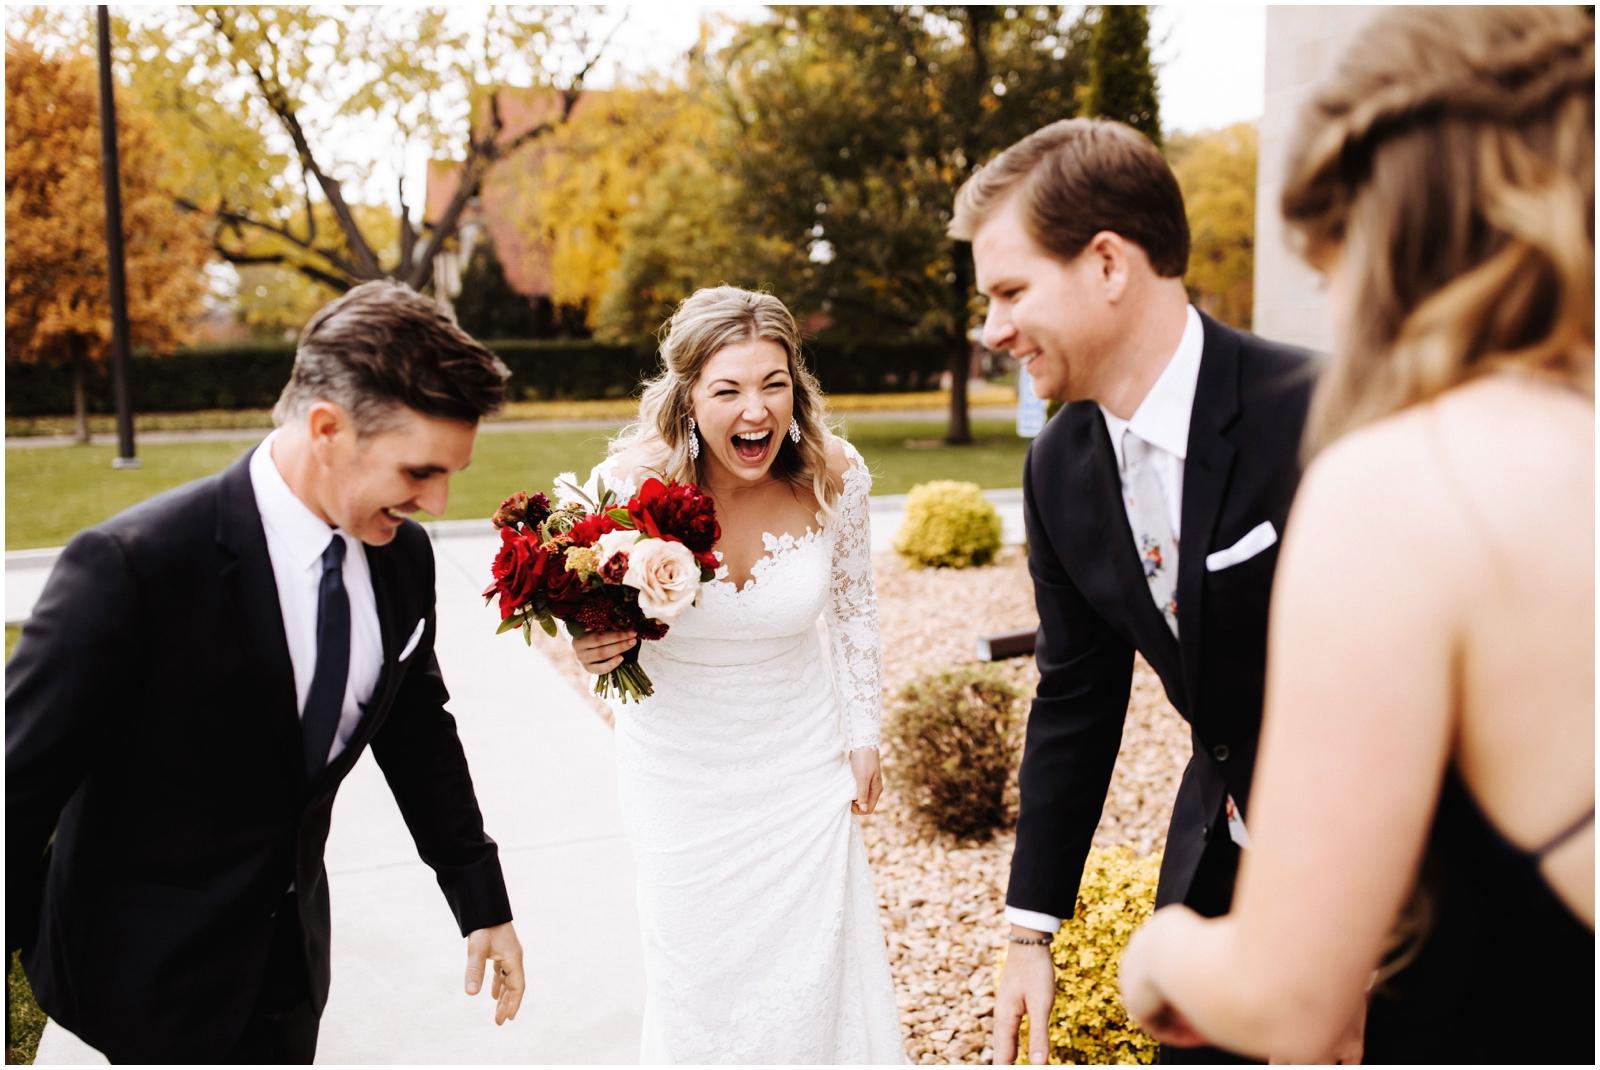 Minnesota Wedding Planner, Mpls Wedding Planner, Machine Shop MPLS, Mpls Wedding Venue. Bride and groom